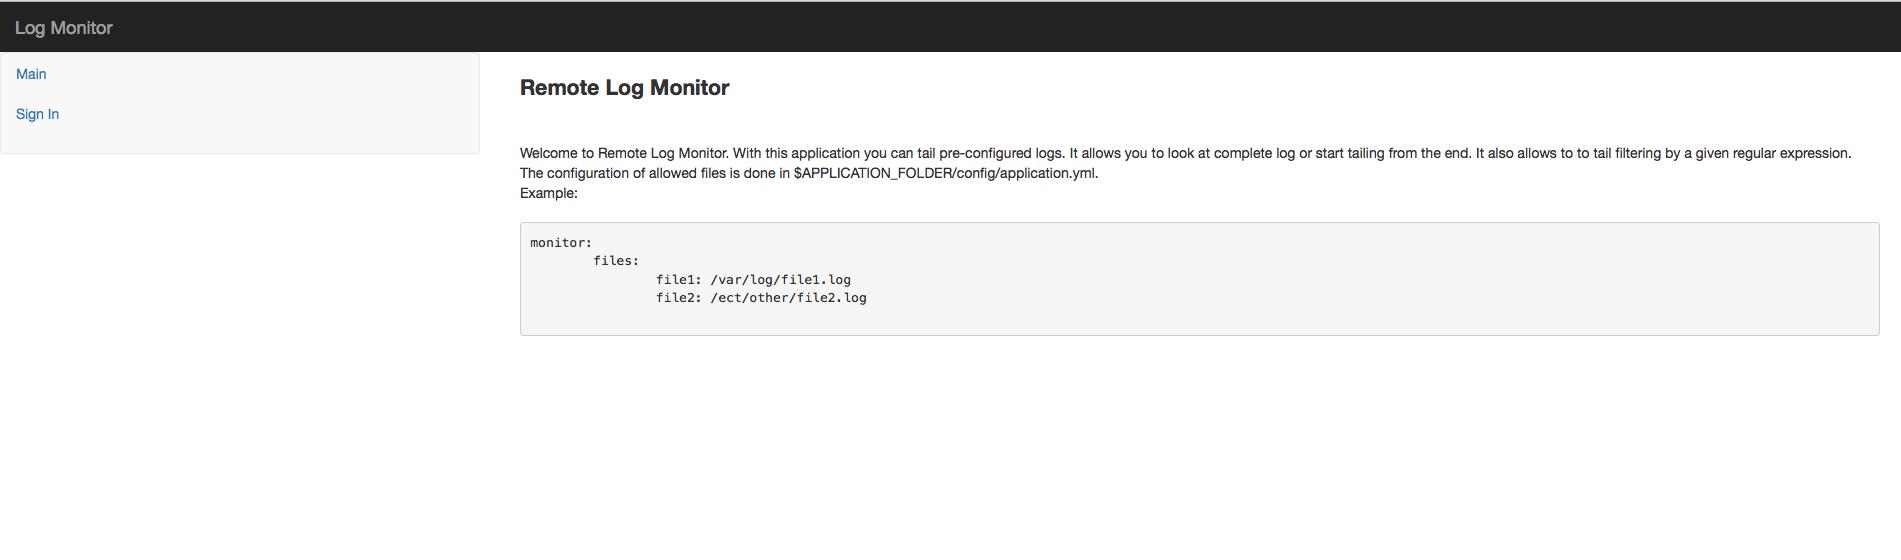 Remote Log Monitor Download Starter Sign Main Screen Before Login